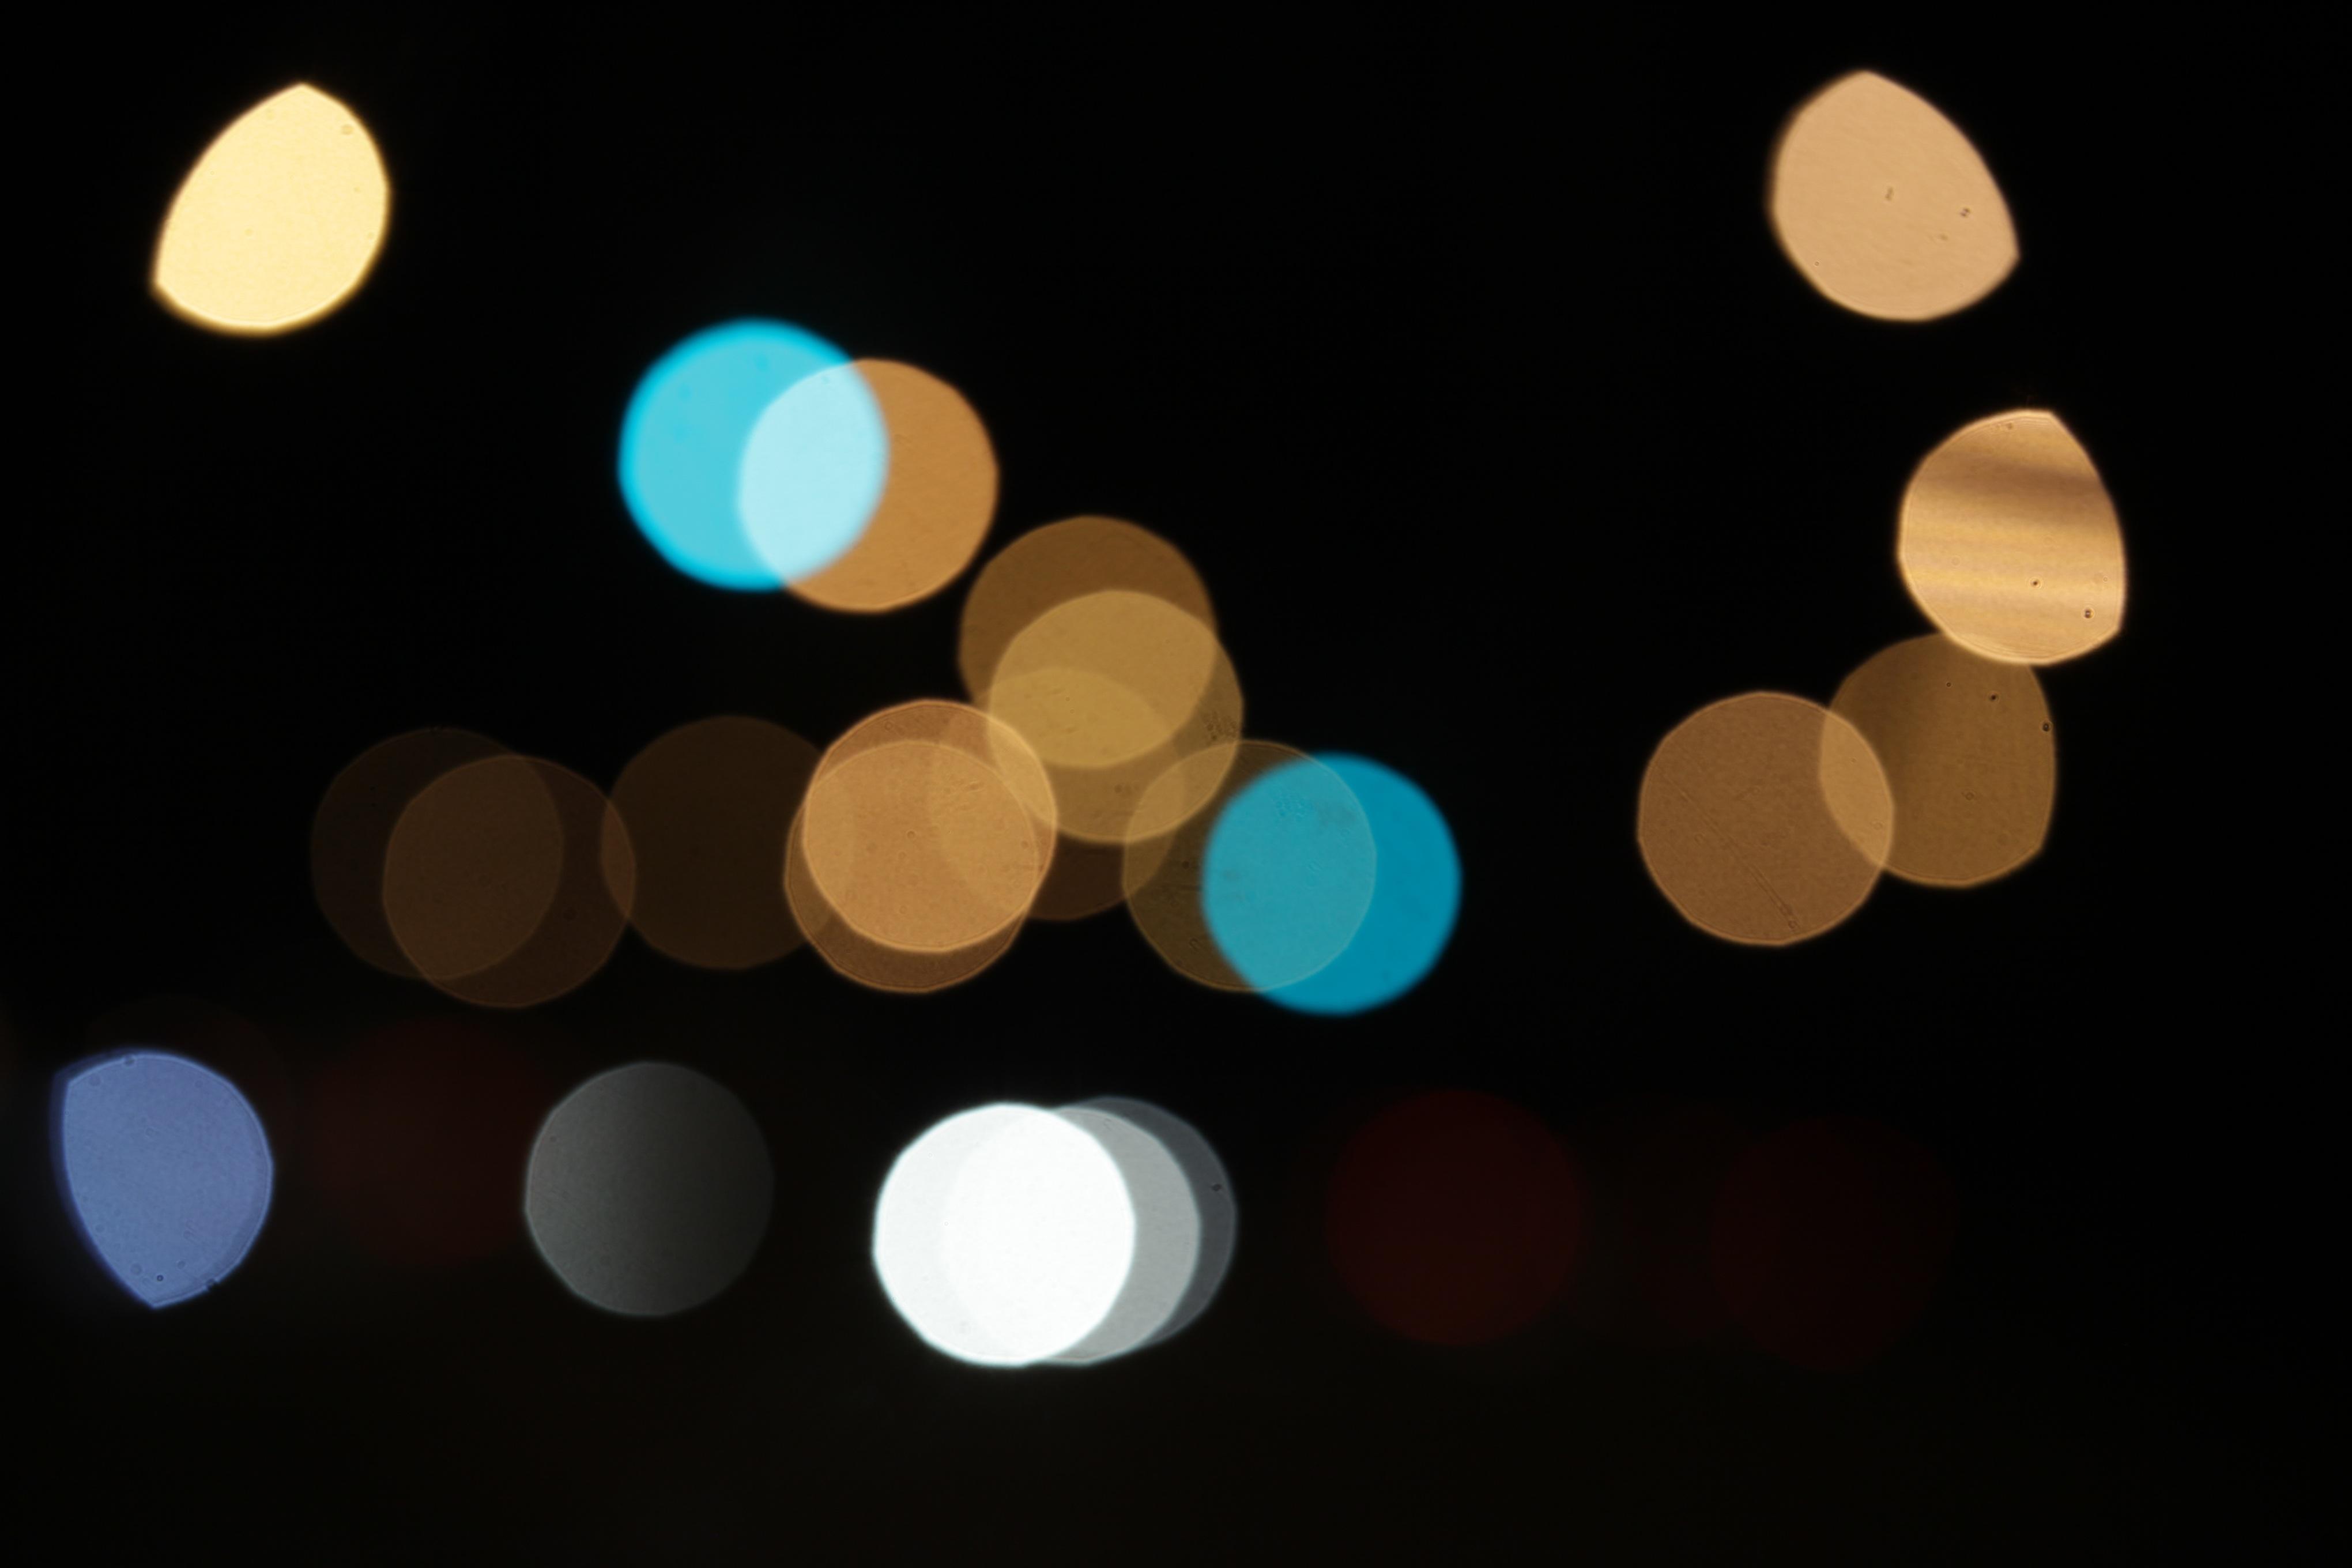 Line Color Form : Free images : light number city line geometric color darkness